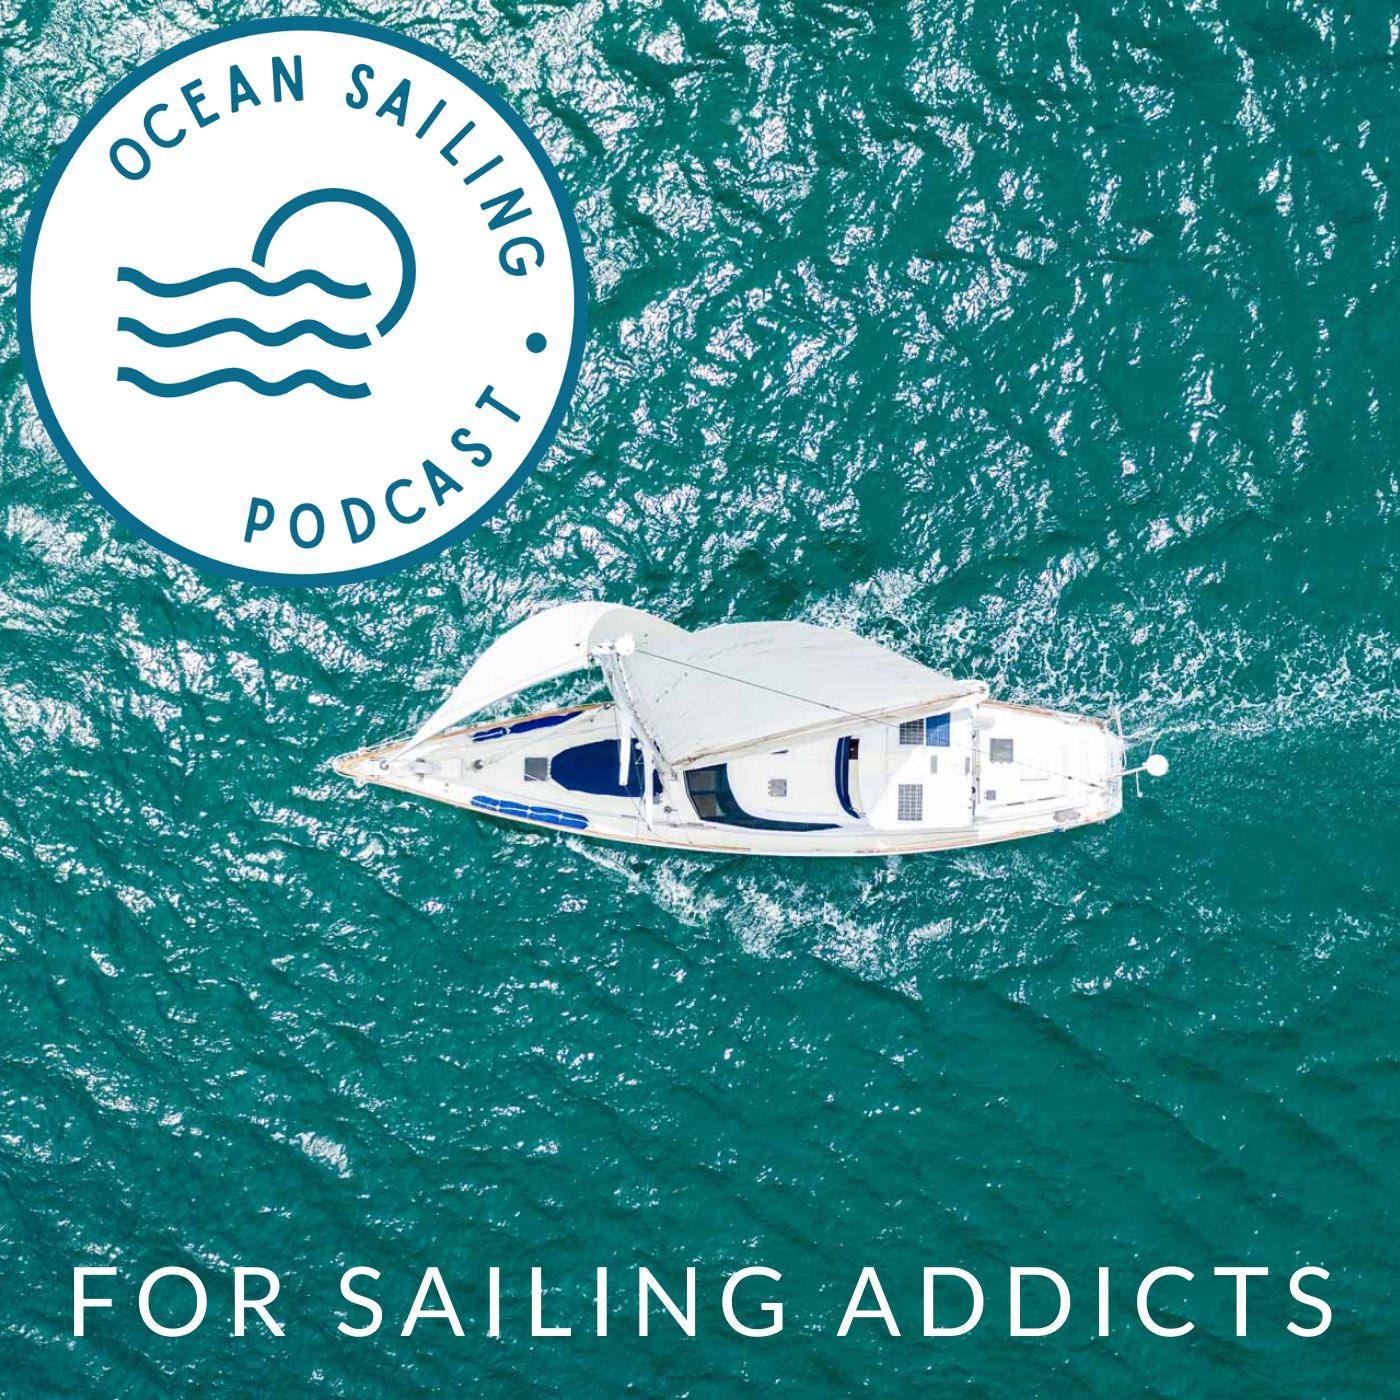 Ocean Sailing Podcast show art